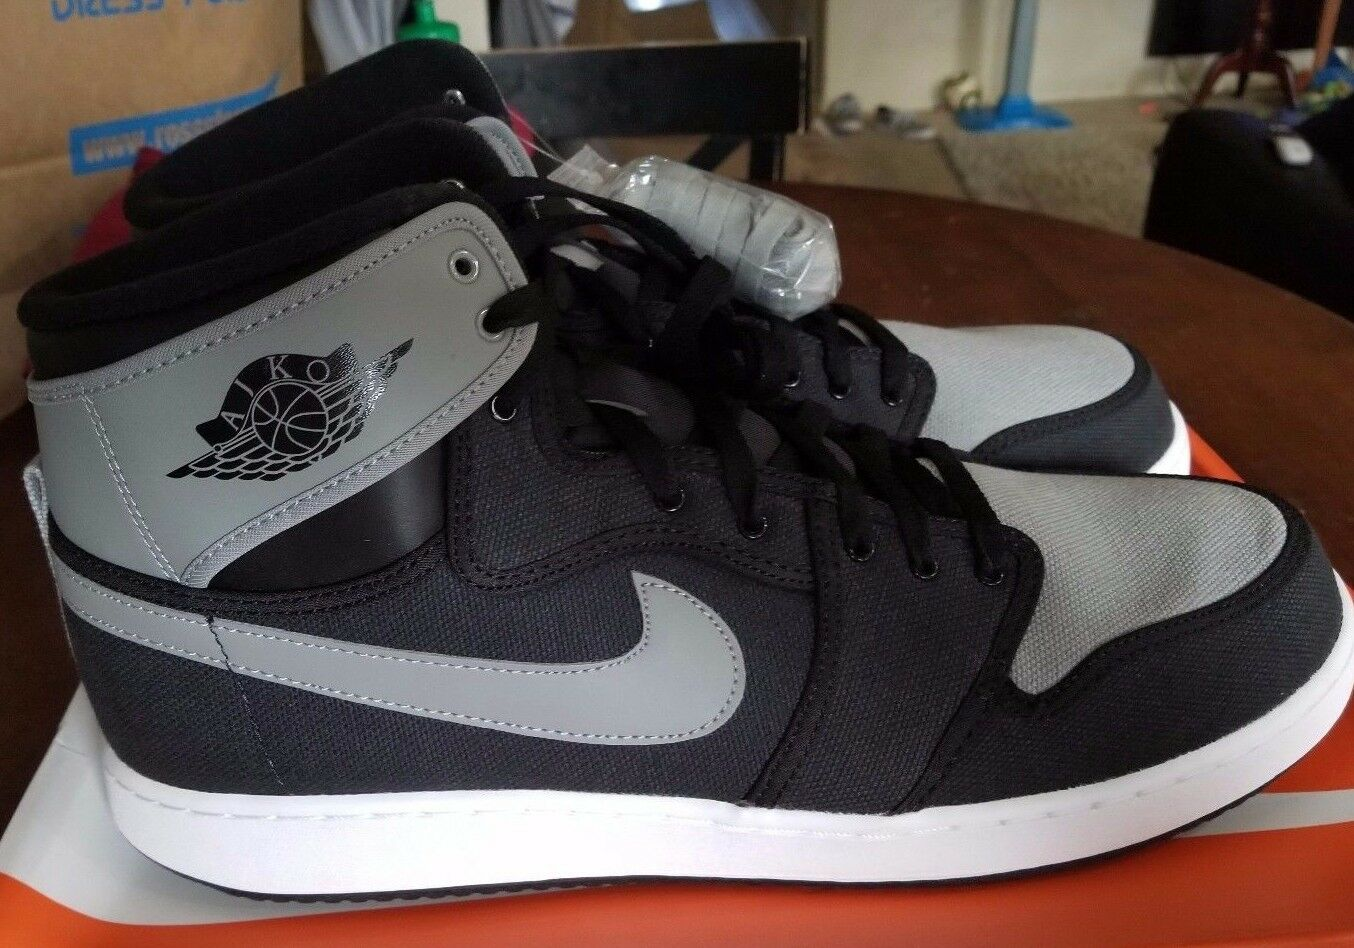 Nike Air Jordan 1 Aj1 Ko Alto / Og Dimensioni 15... 638471 003 Nero / Alto Ombra Grigia 096ede